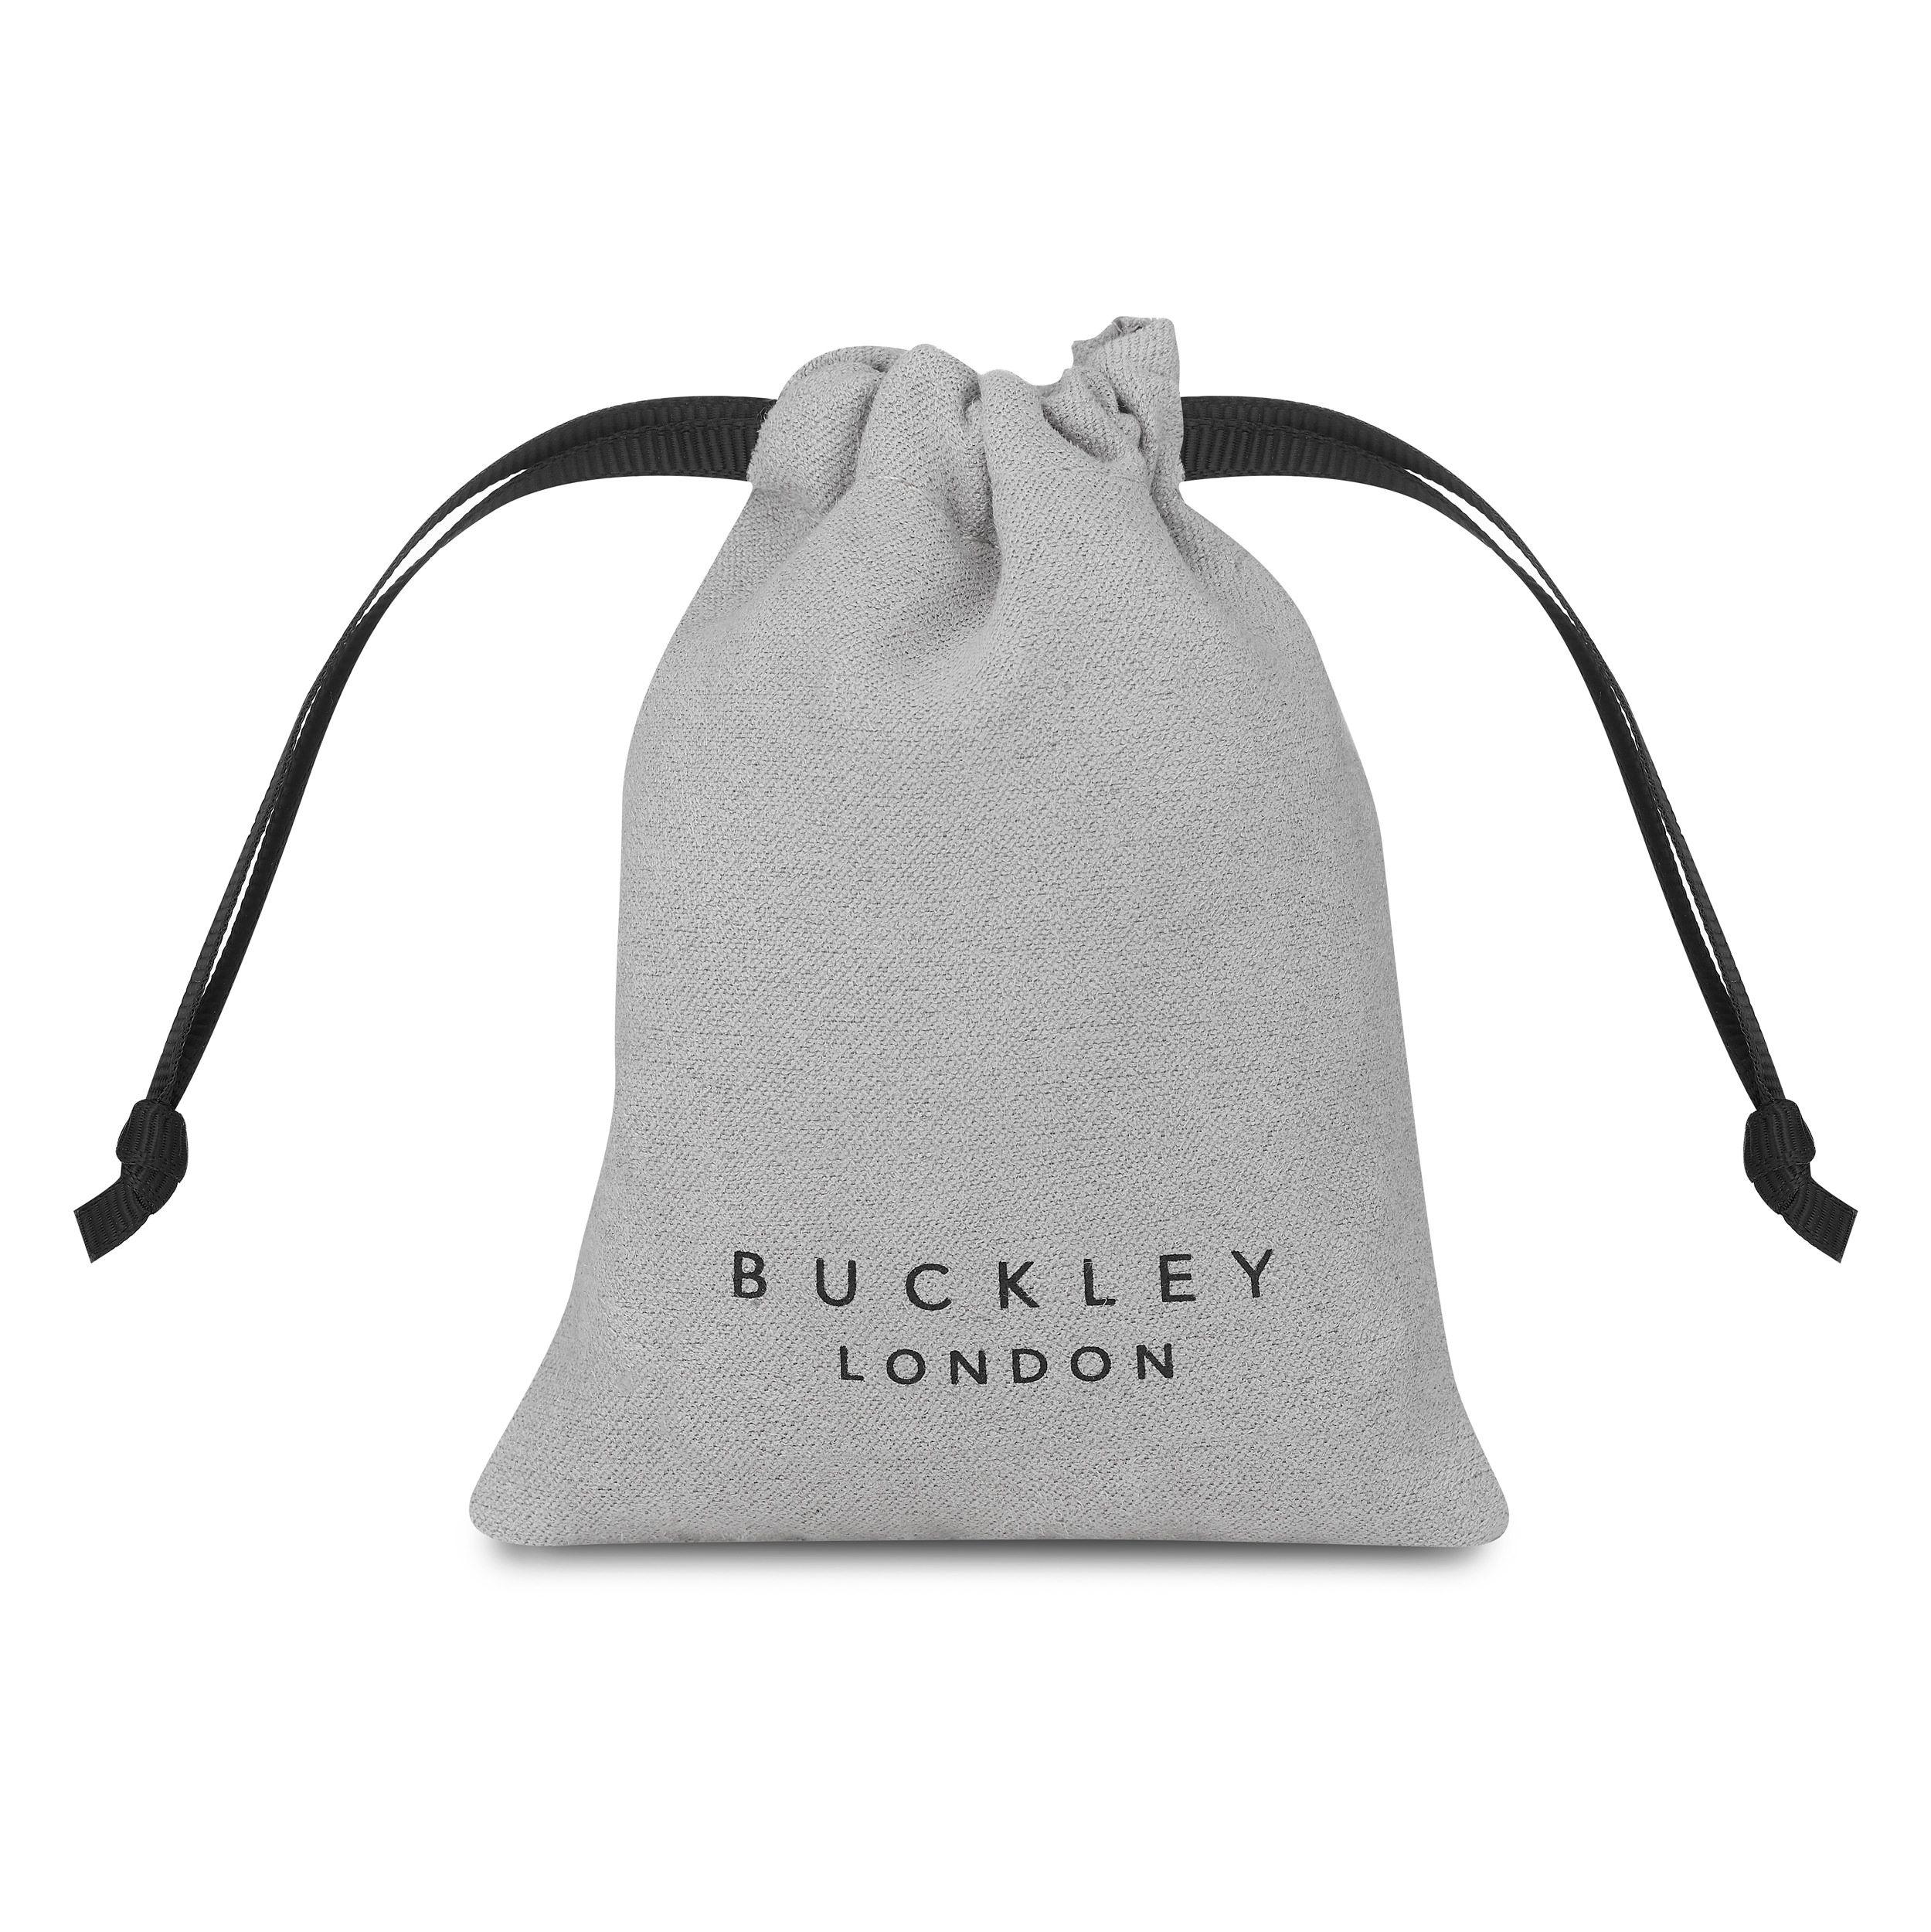 Buckley London Hugs & Kisses '♥' Bracelet - Silver Bag